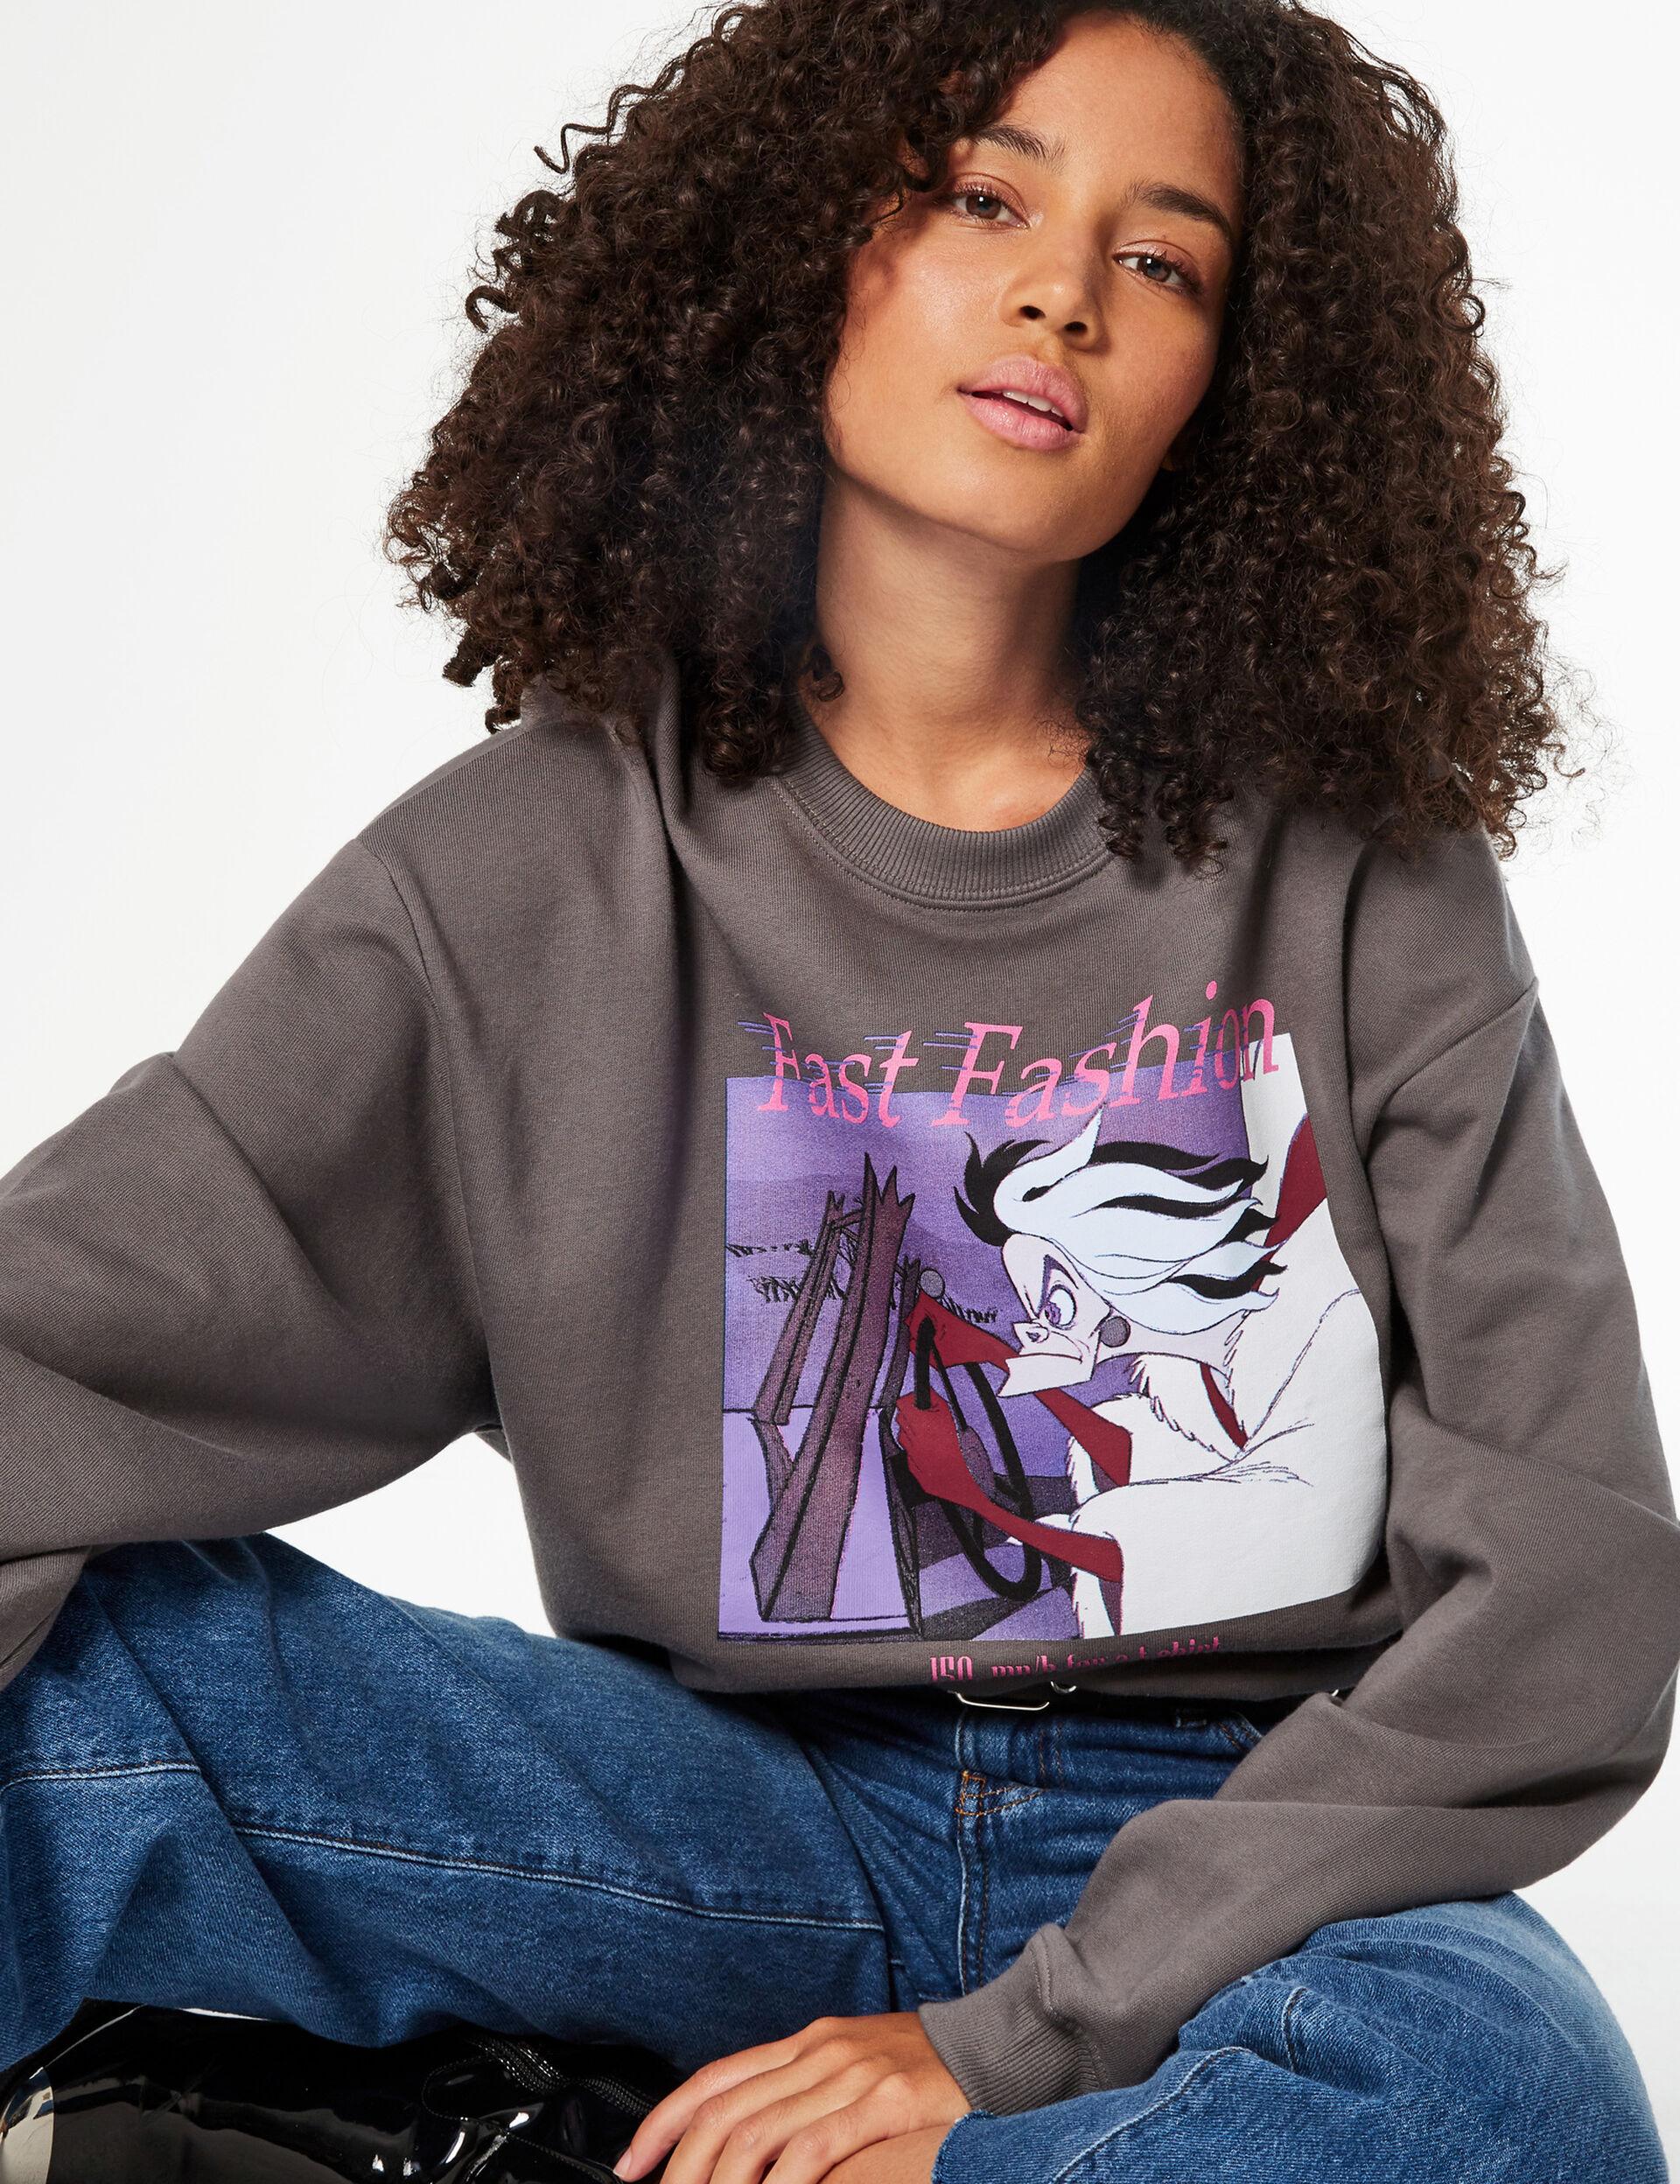 Disney Cruella de Vil sweatshirt